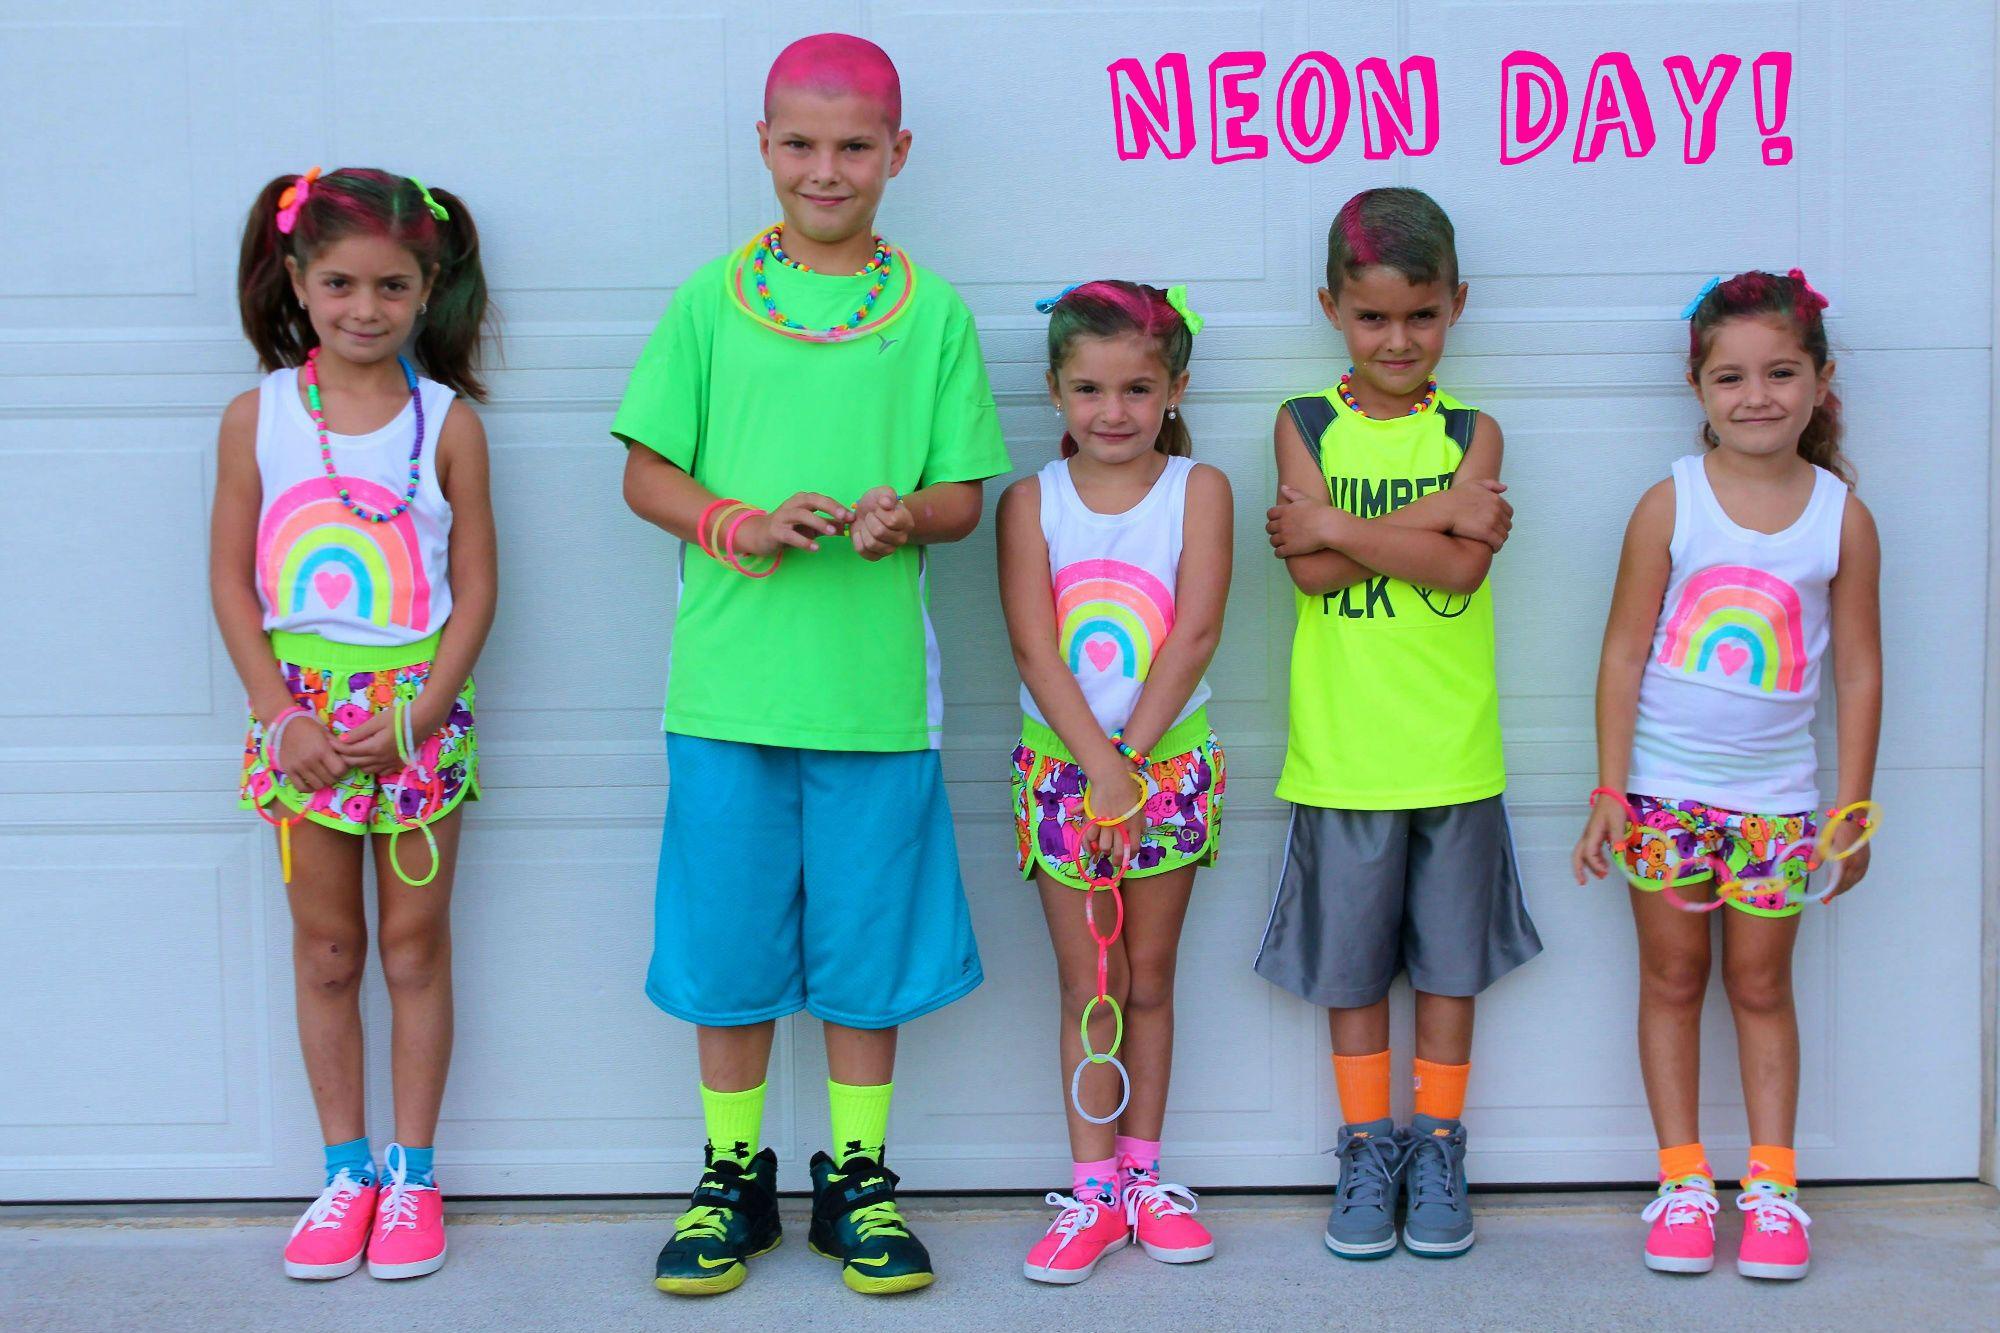 Wear neon clipart image stock Neon Day!!! | spirit week ideas | School spirit days, Sports day ... image stock